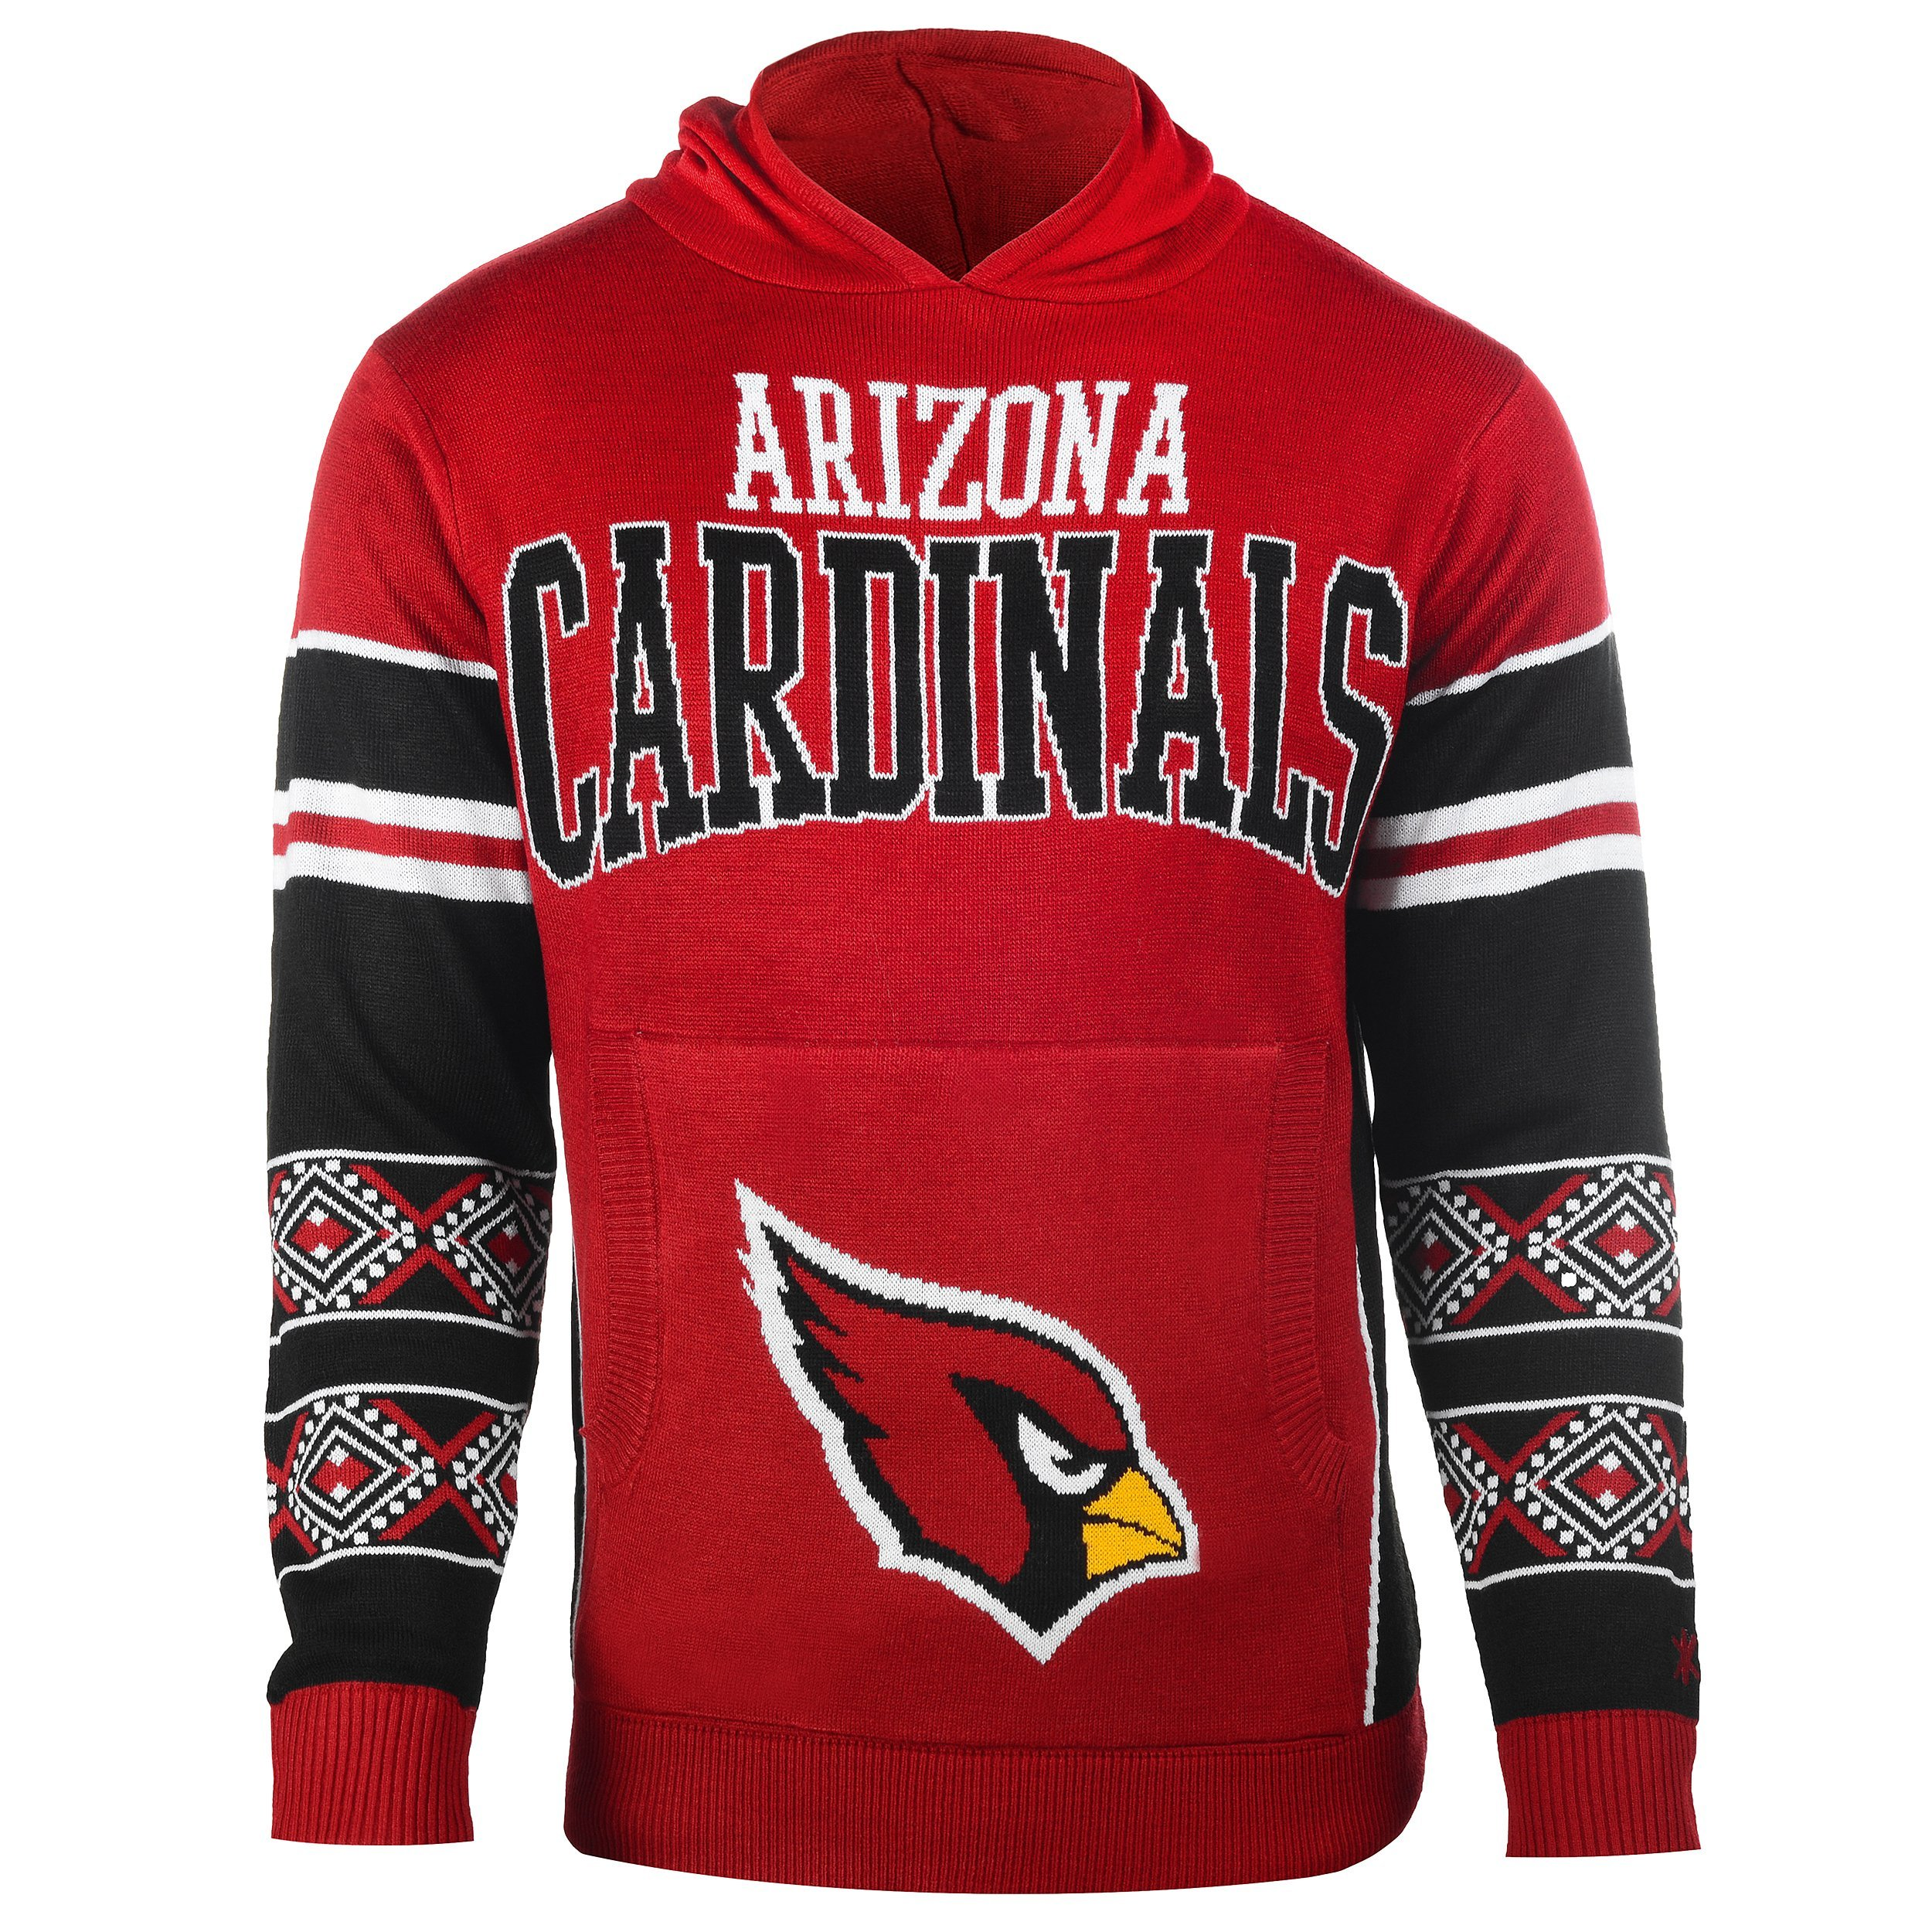 Arizona Cardinals Big Logo Hooded Sweater Medium